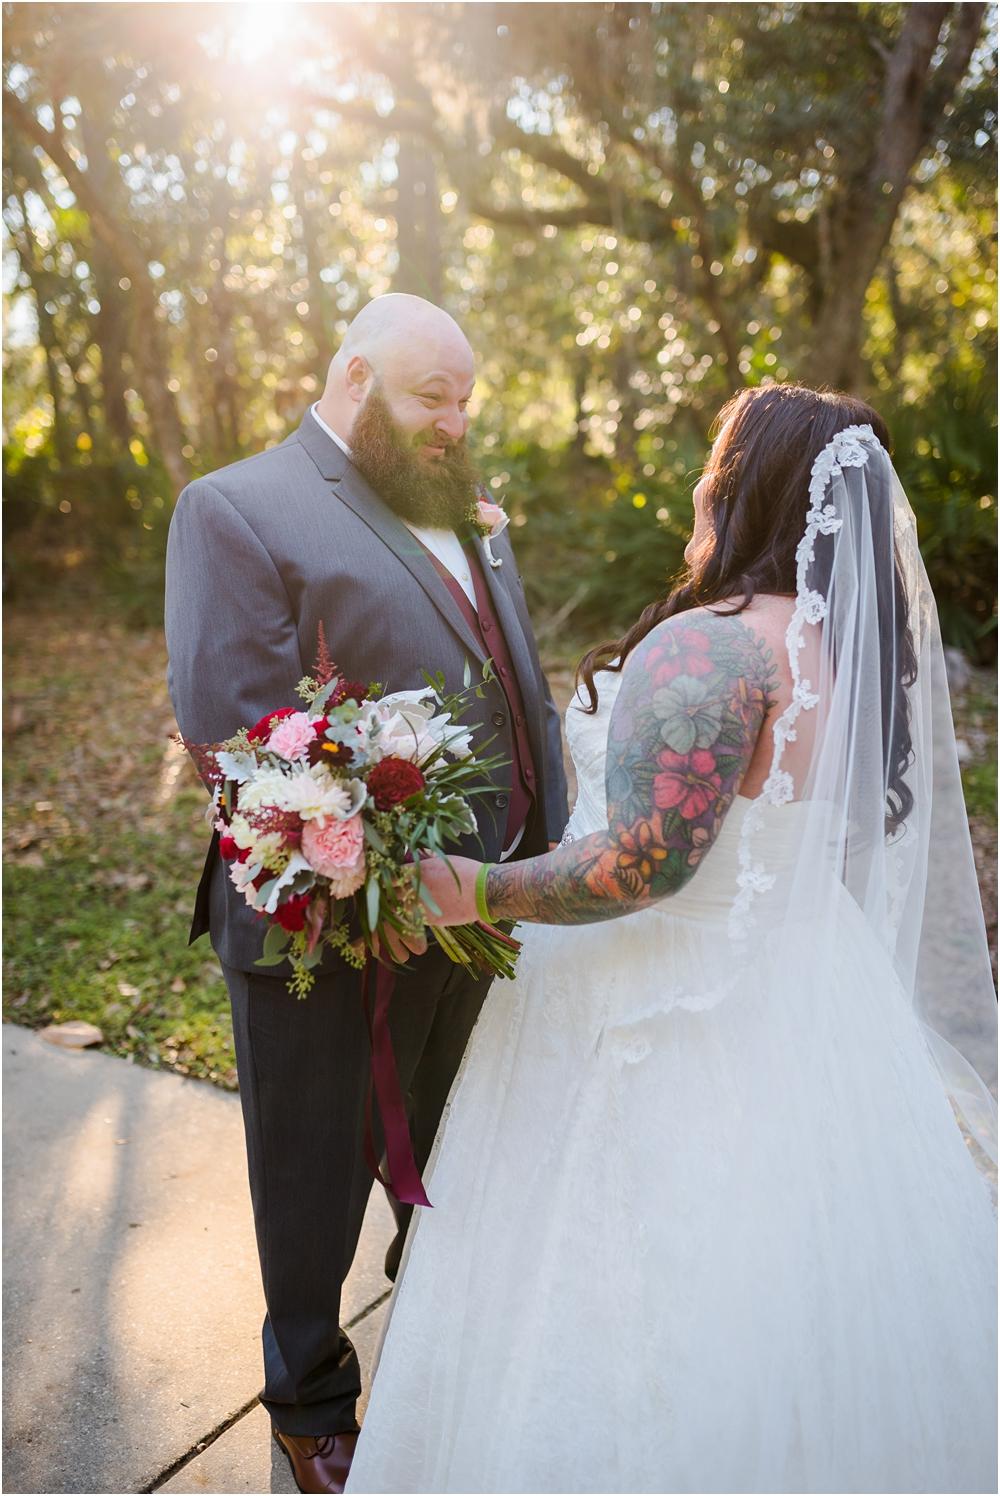 Eden-Gardens-florida-wedding-photographer-kiersten-stevenson-photography-35.jpg